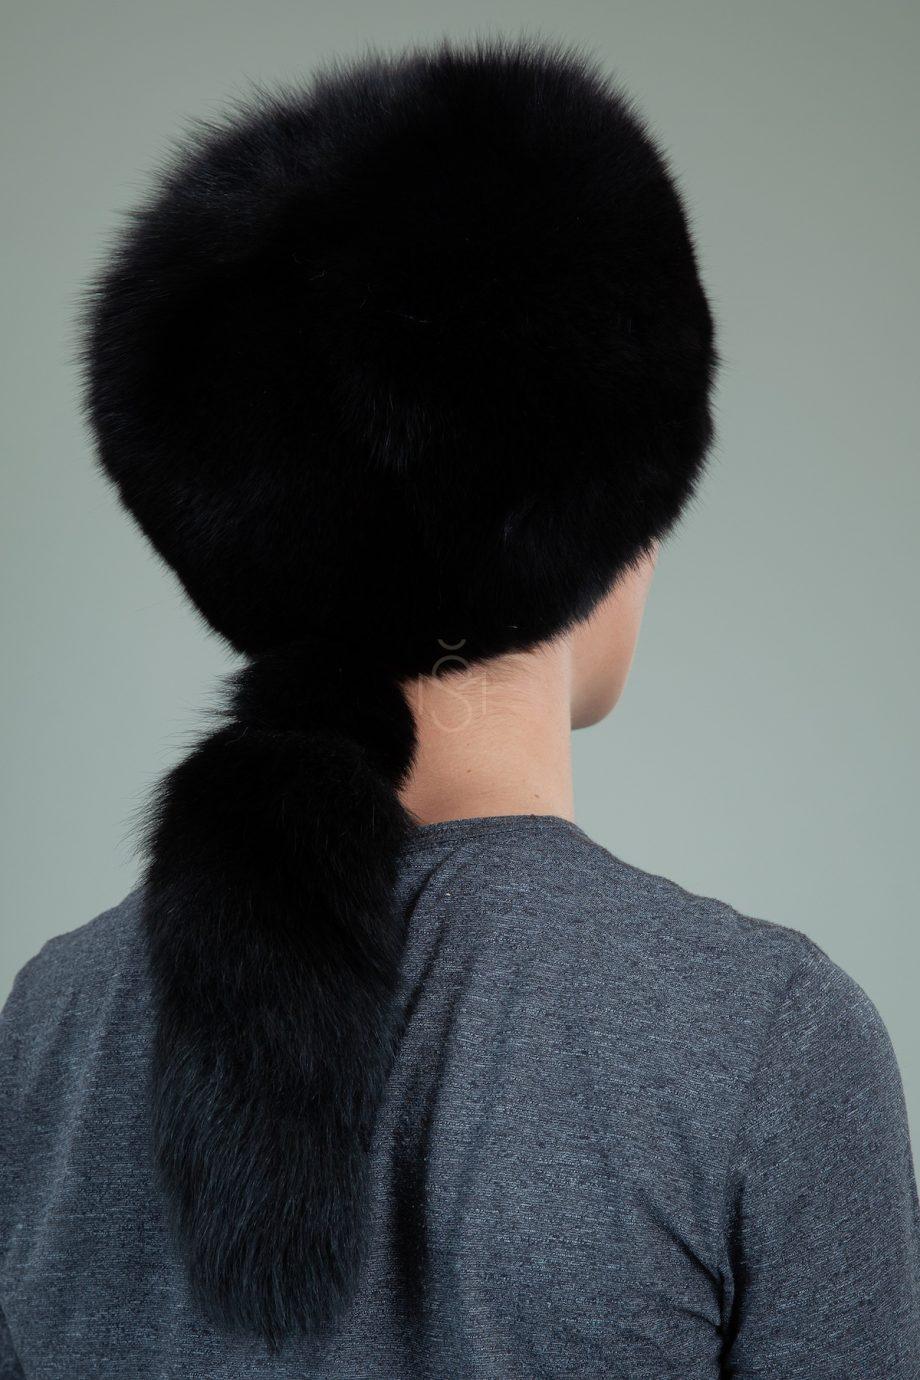 juodos lapes kailio kepure su prisegama uodega